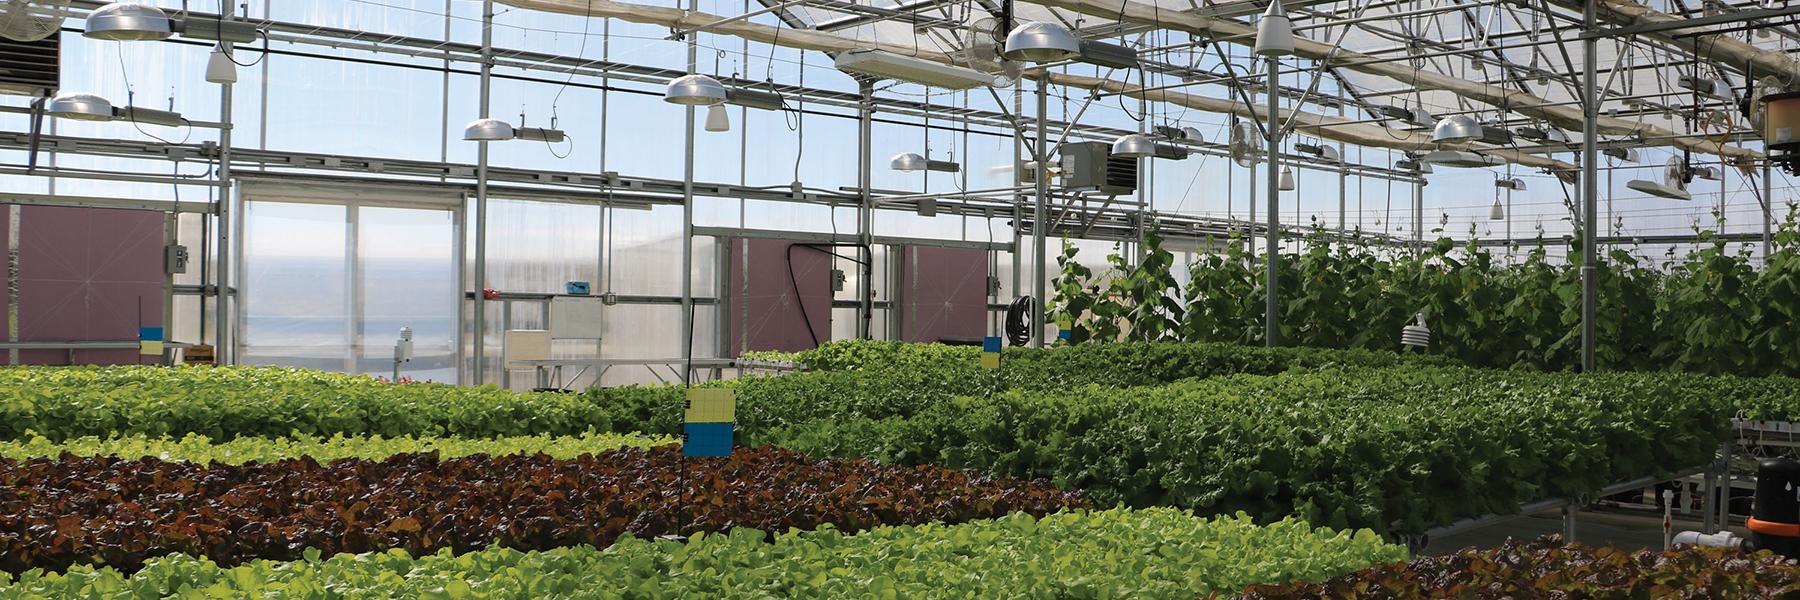 Interior Greenhouse with hydroponics